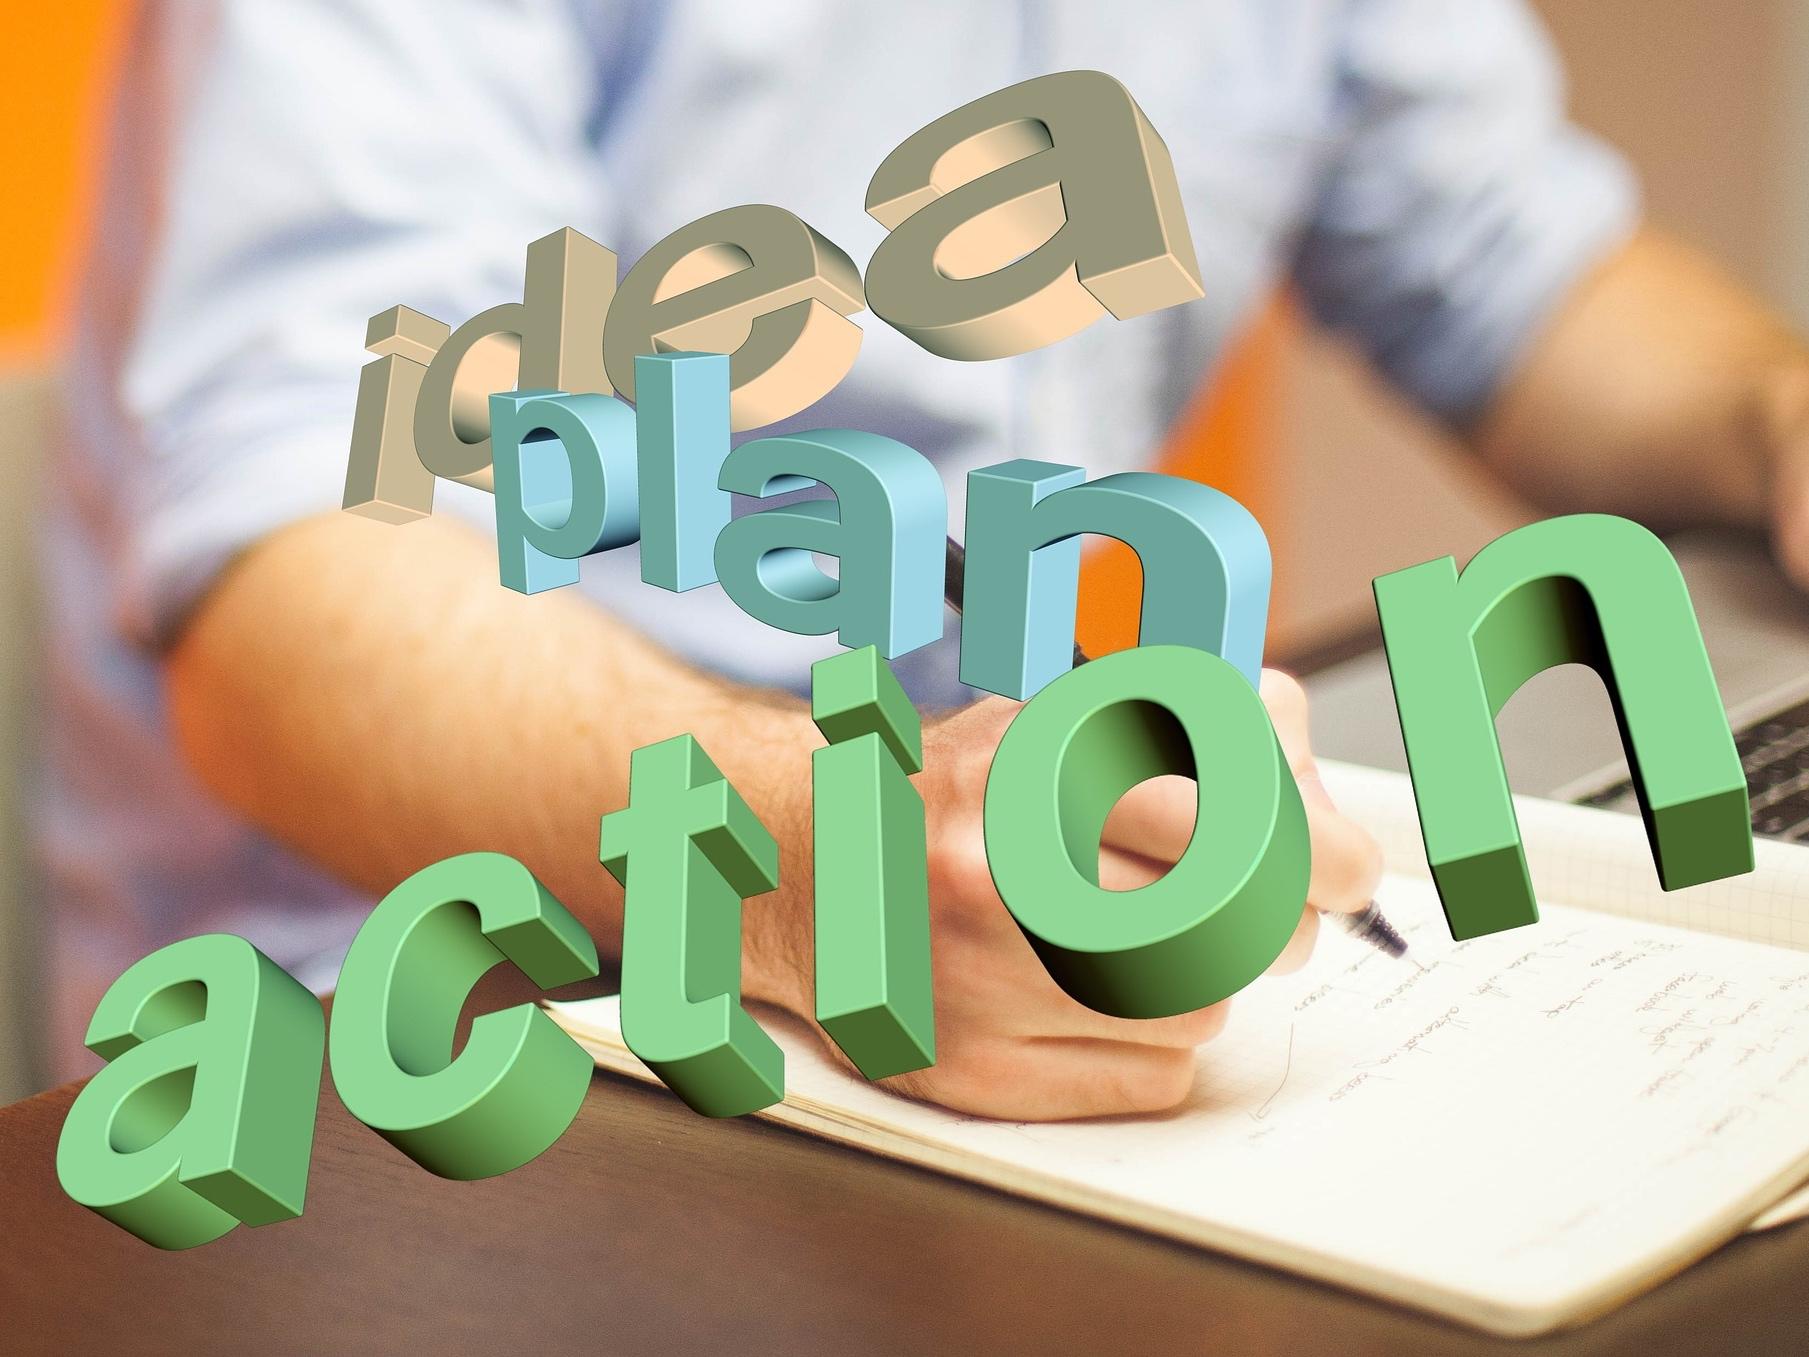 idea-plan-action.jpg